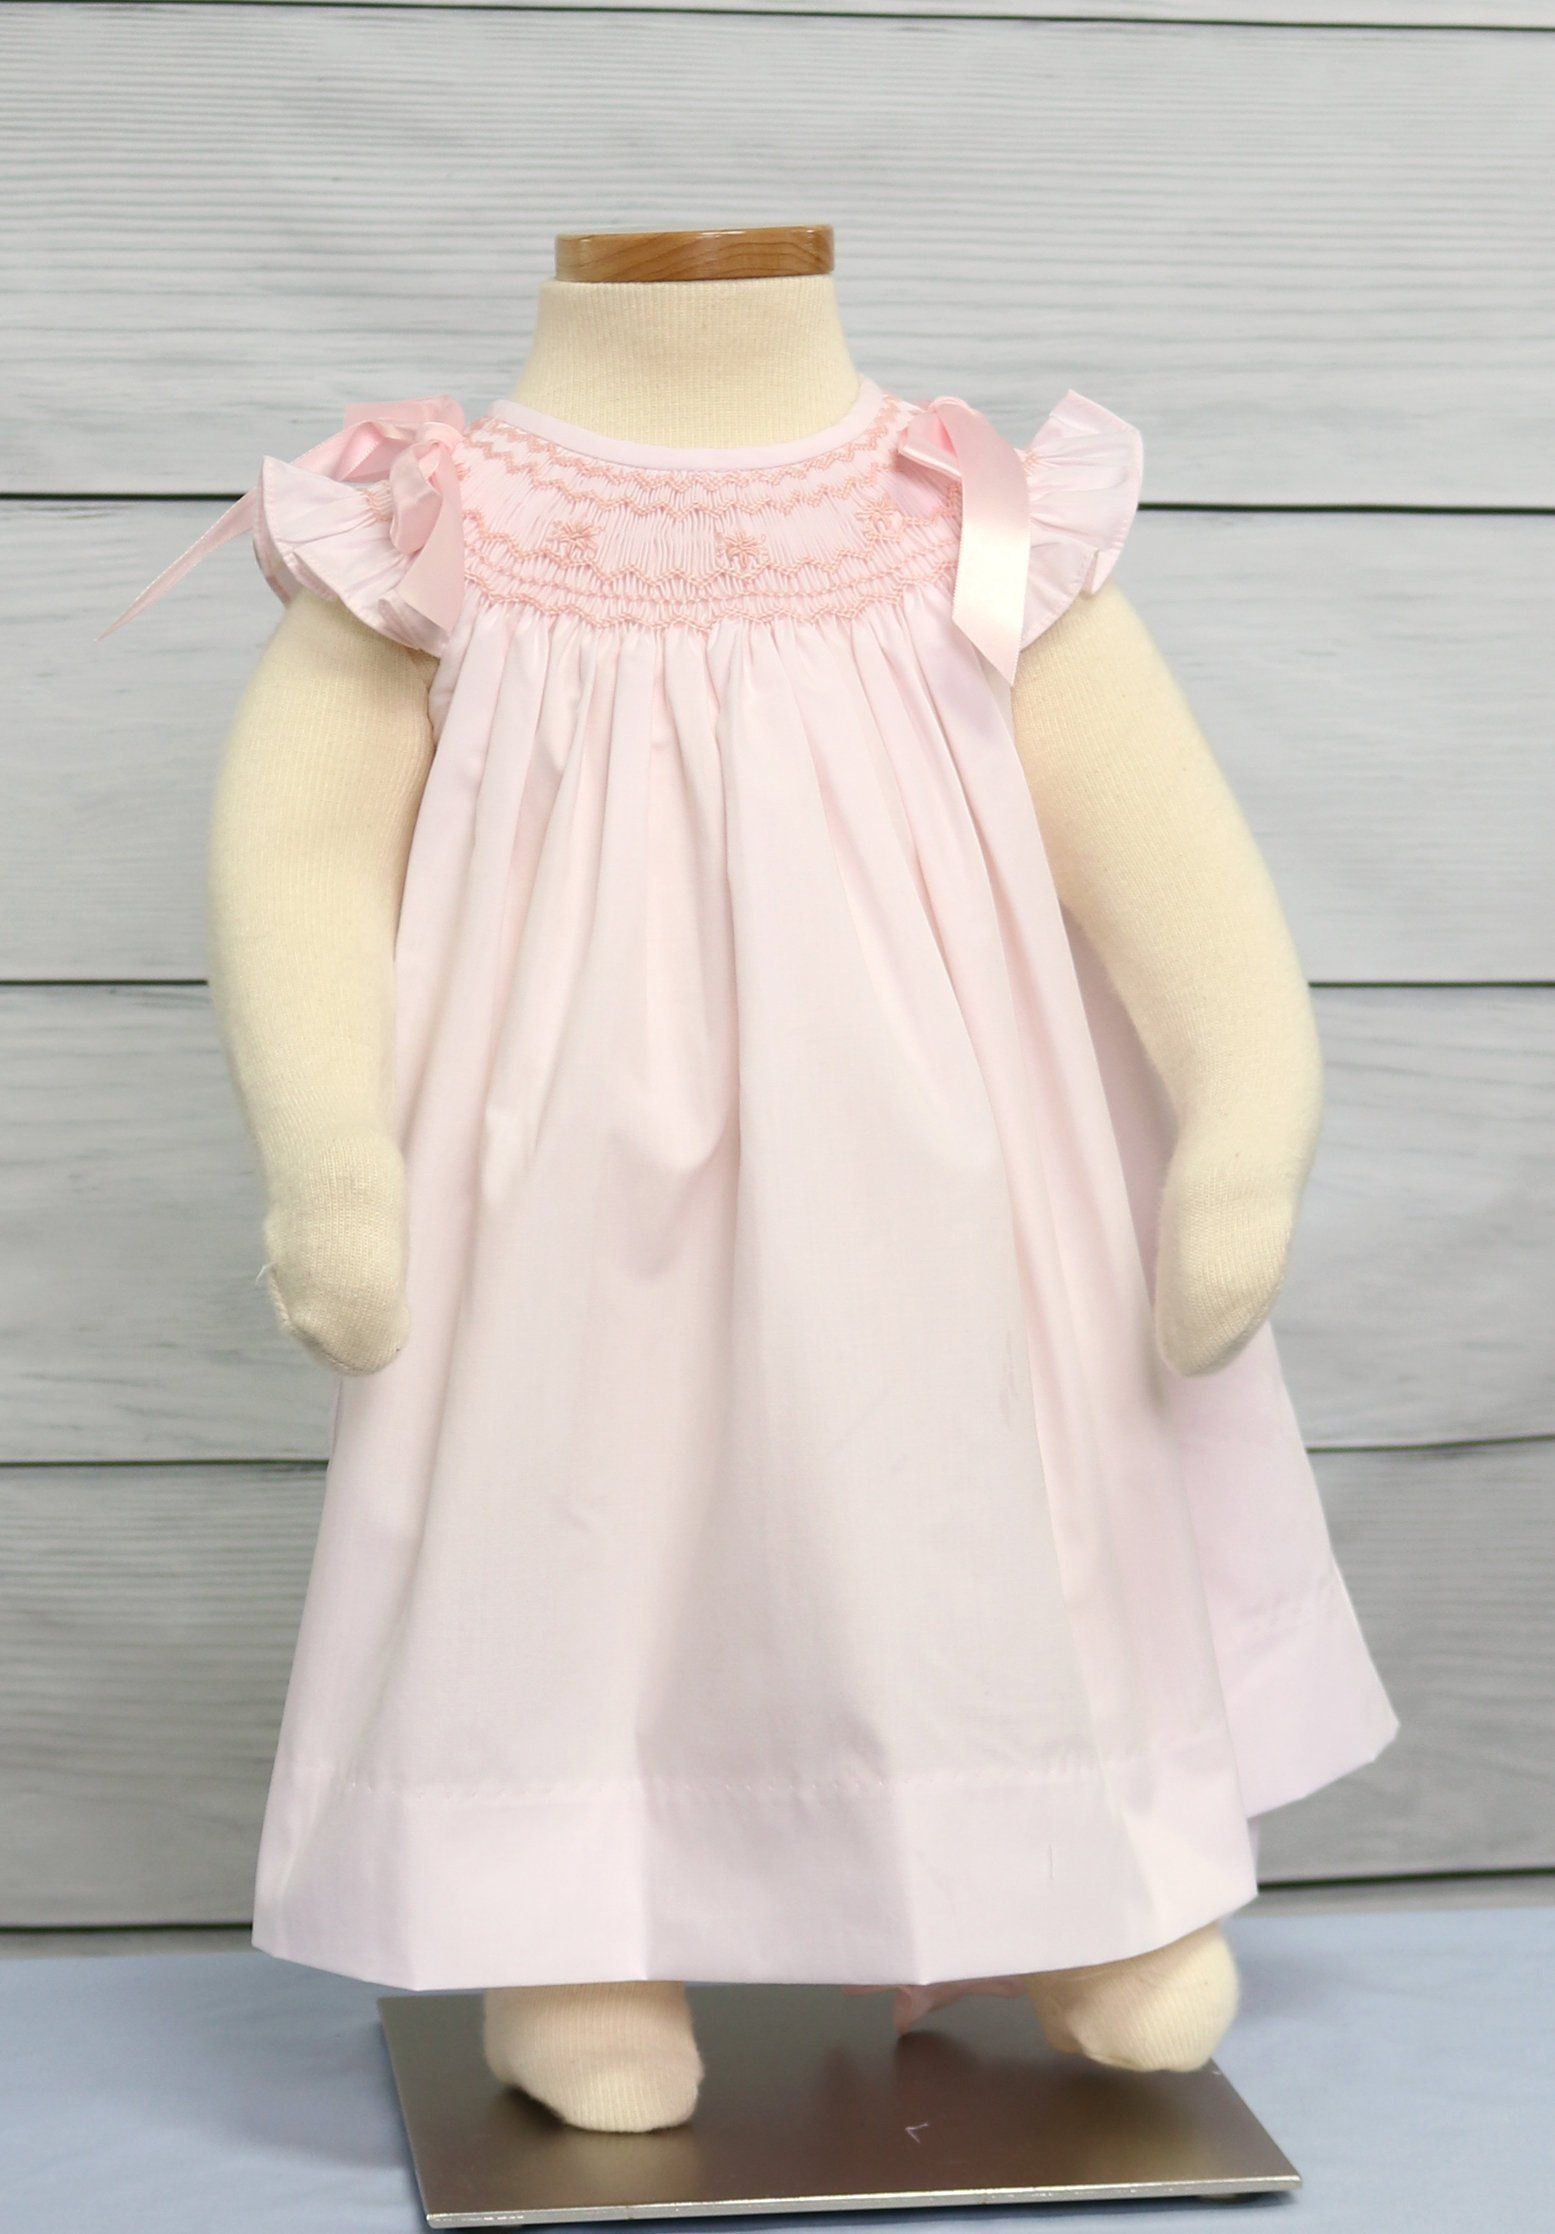 Baptism dress for baby girl smocked easter dress infant